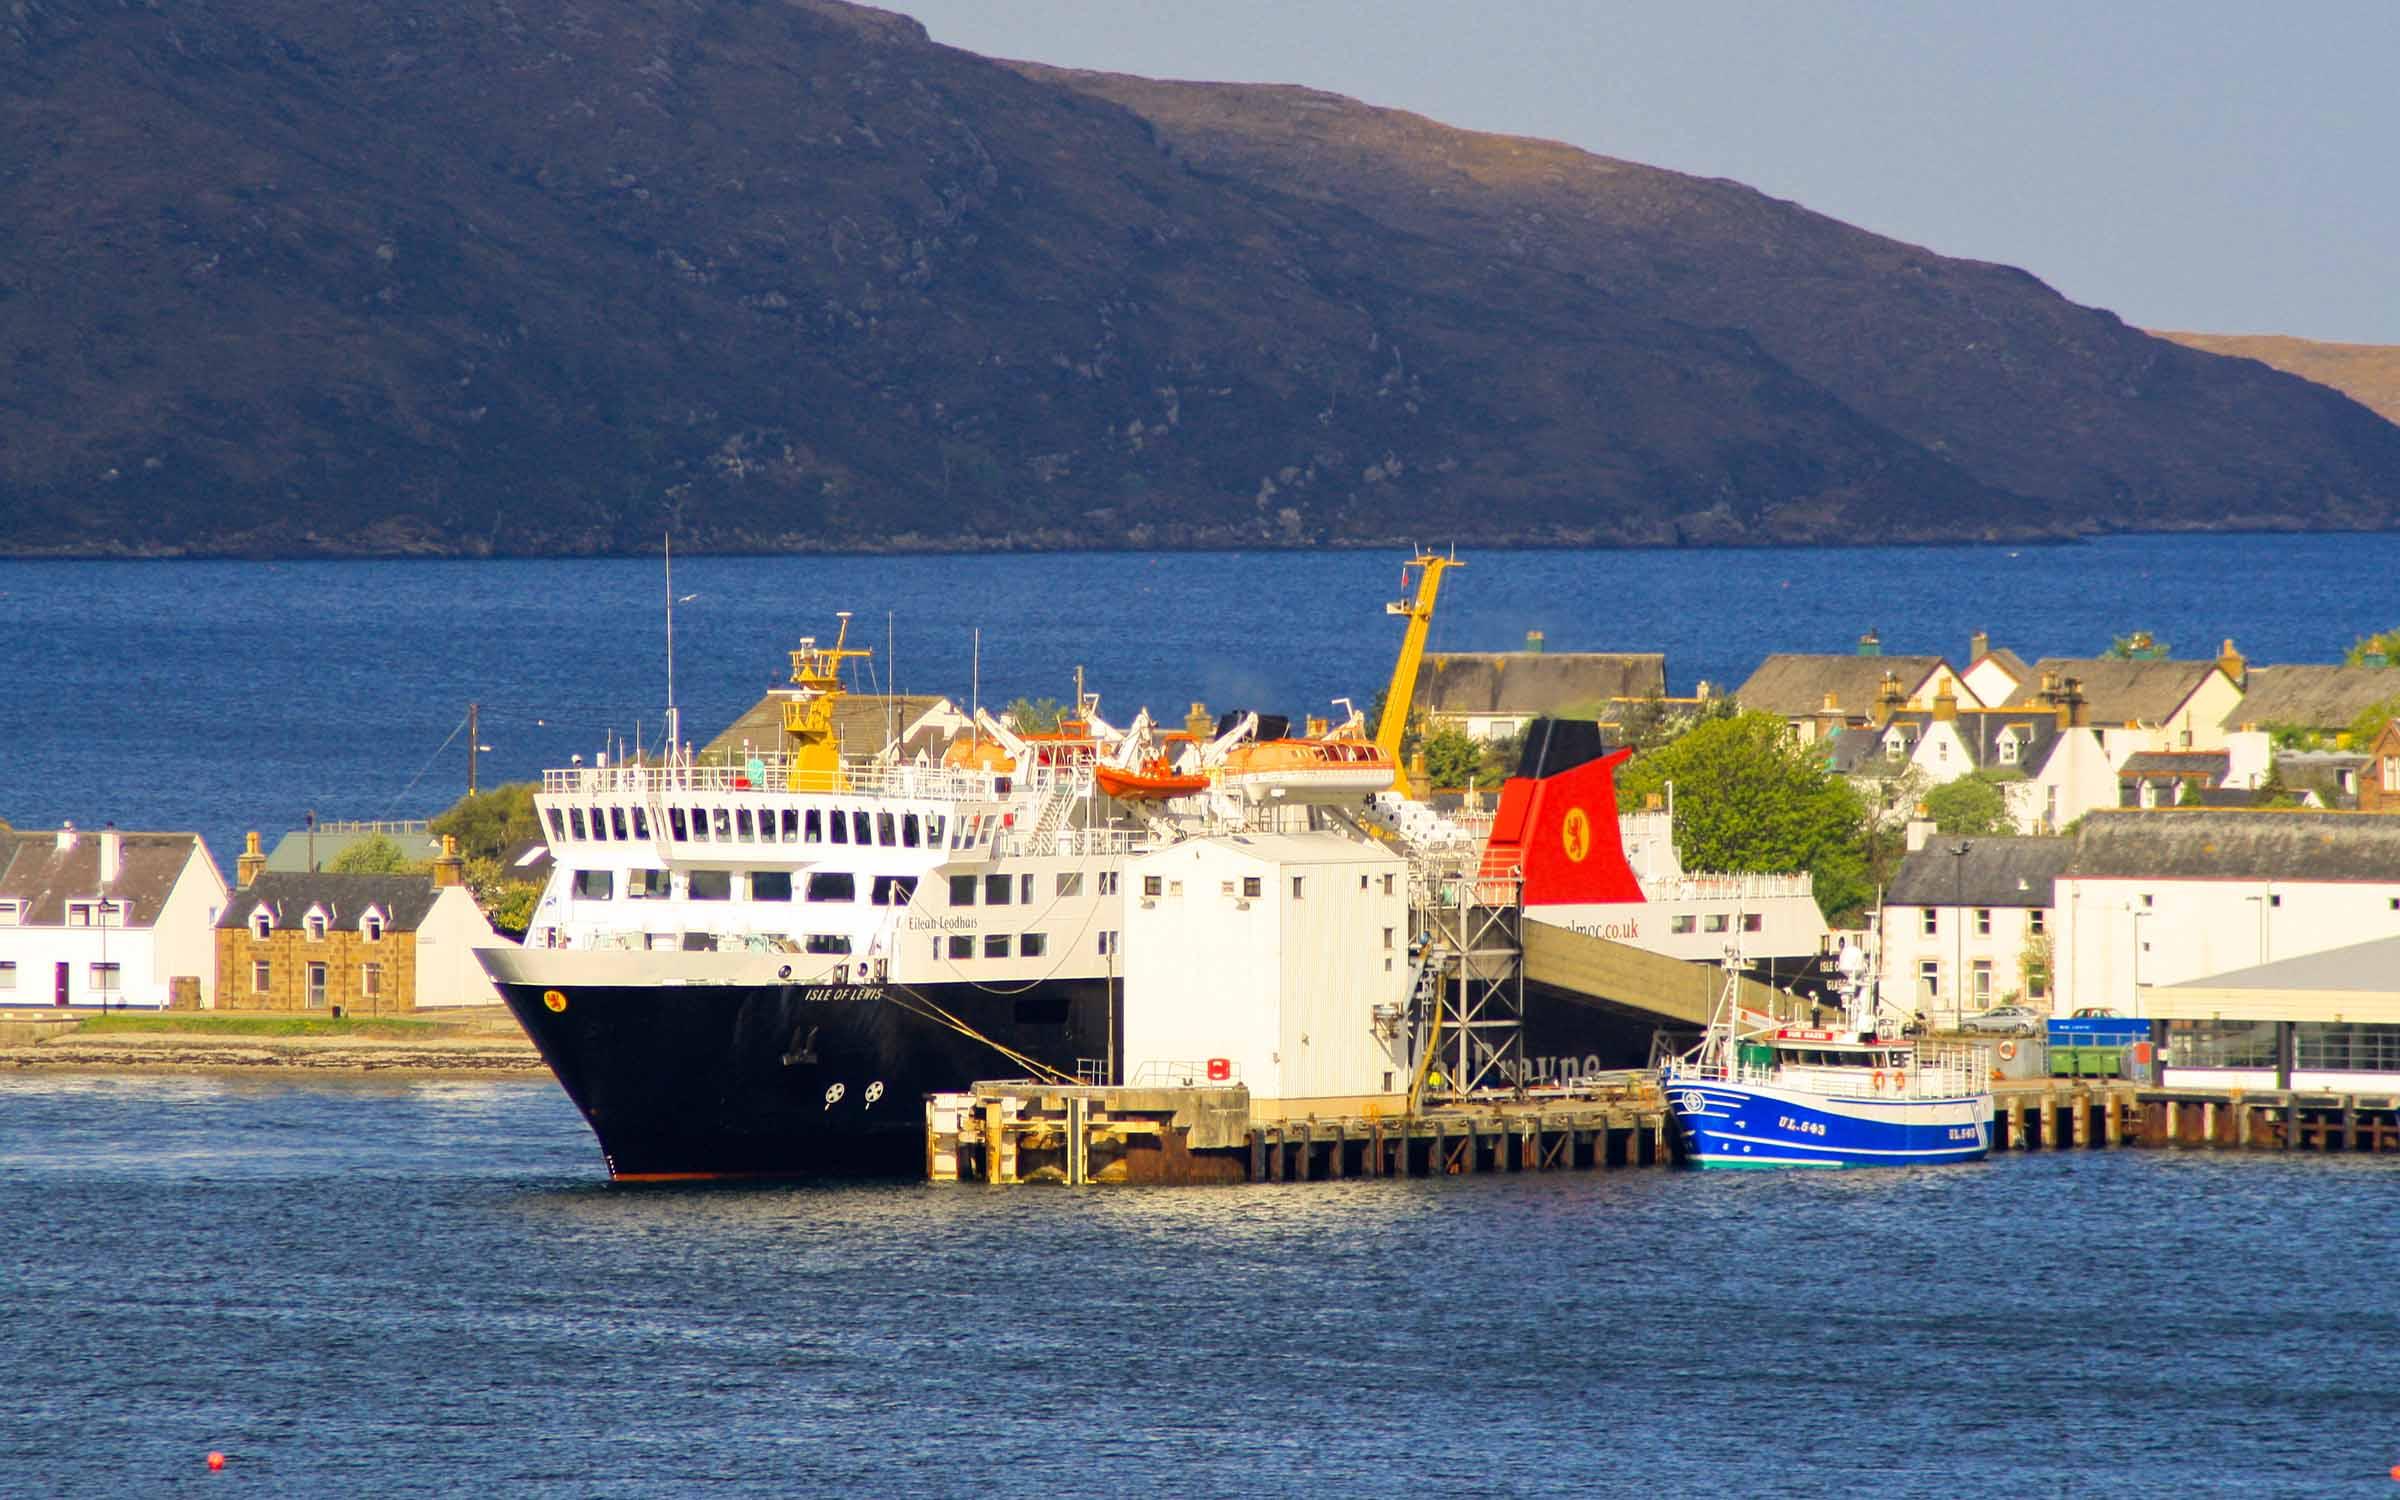 Isle of Lewis at Ullapool (Ships of CalMac)